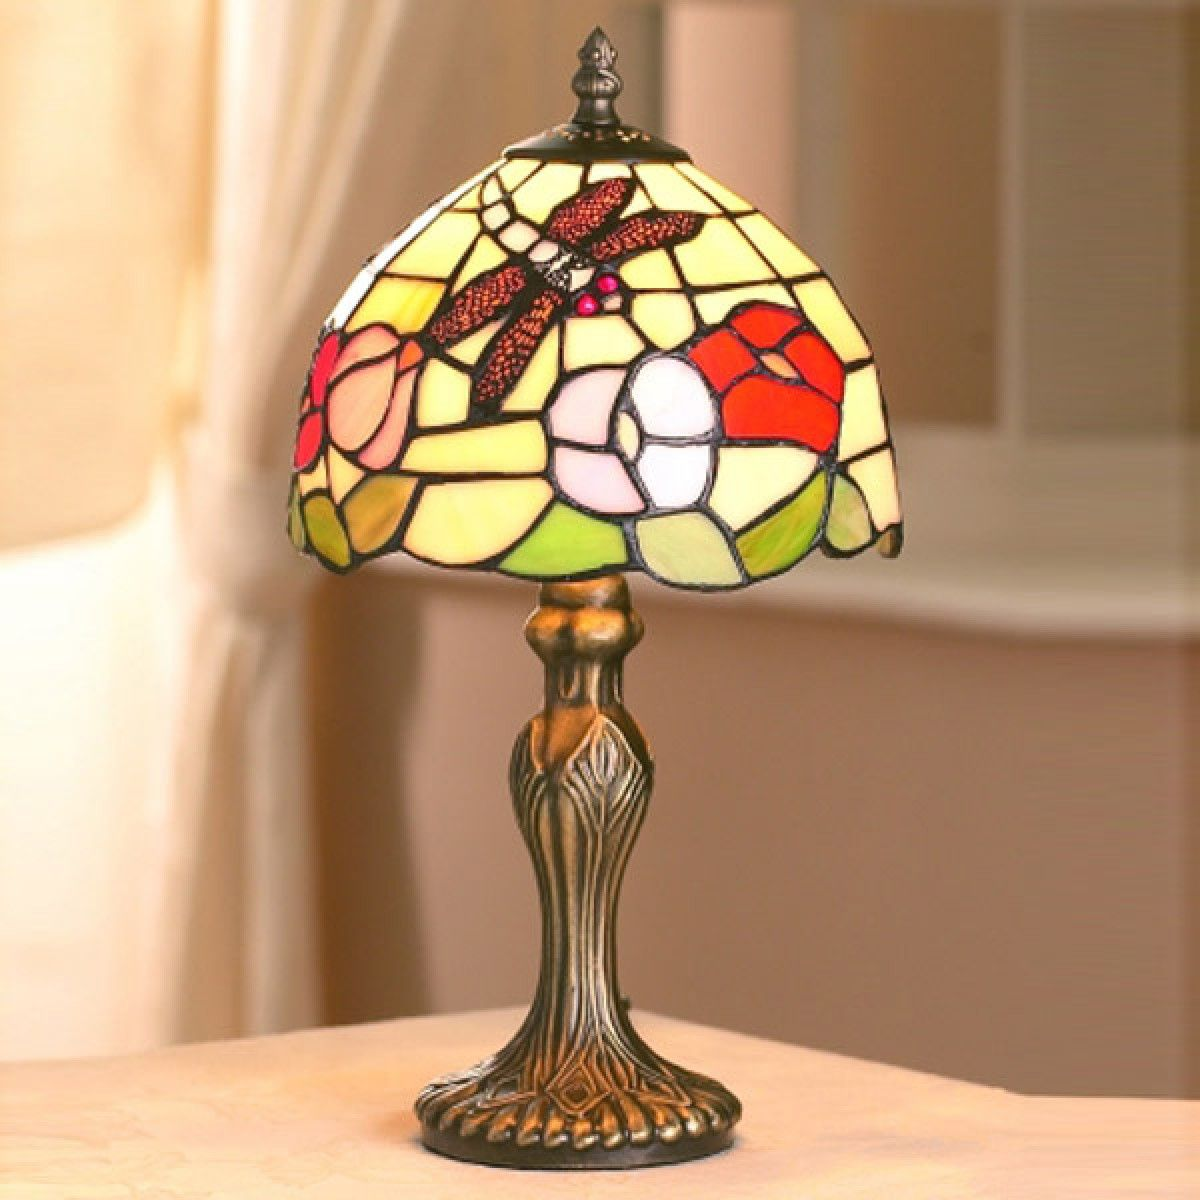 Dragonfly Tiffany Table Lamp (Small) +